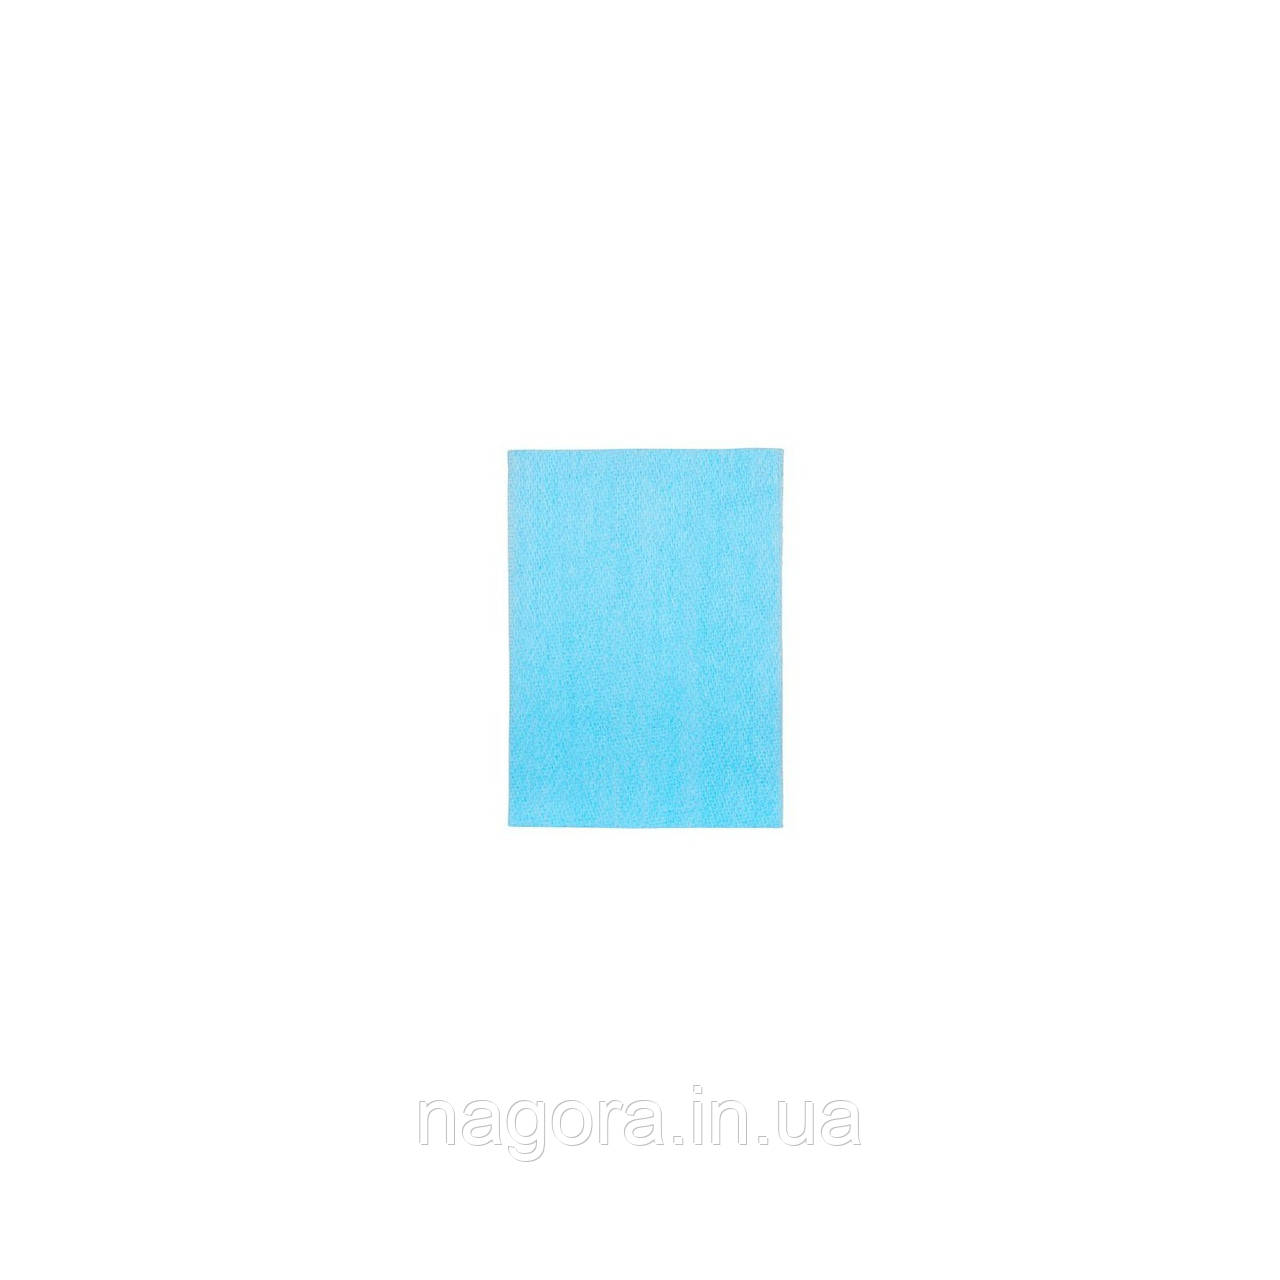 Протирочная липкая салфетка 3M Tack Cloth Aqua 43*30см